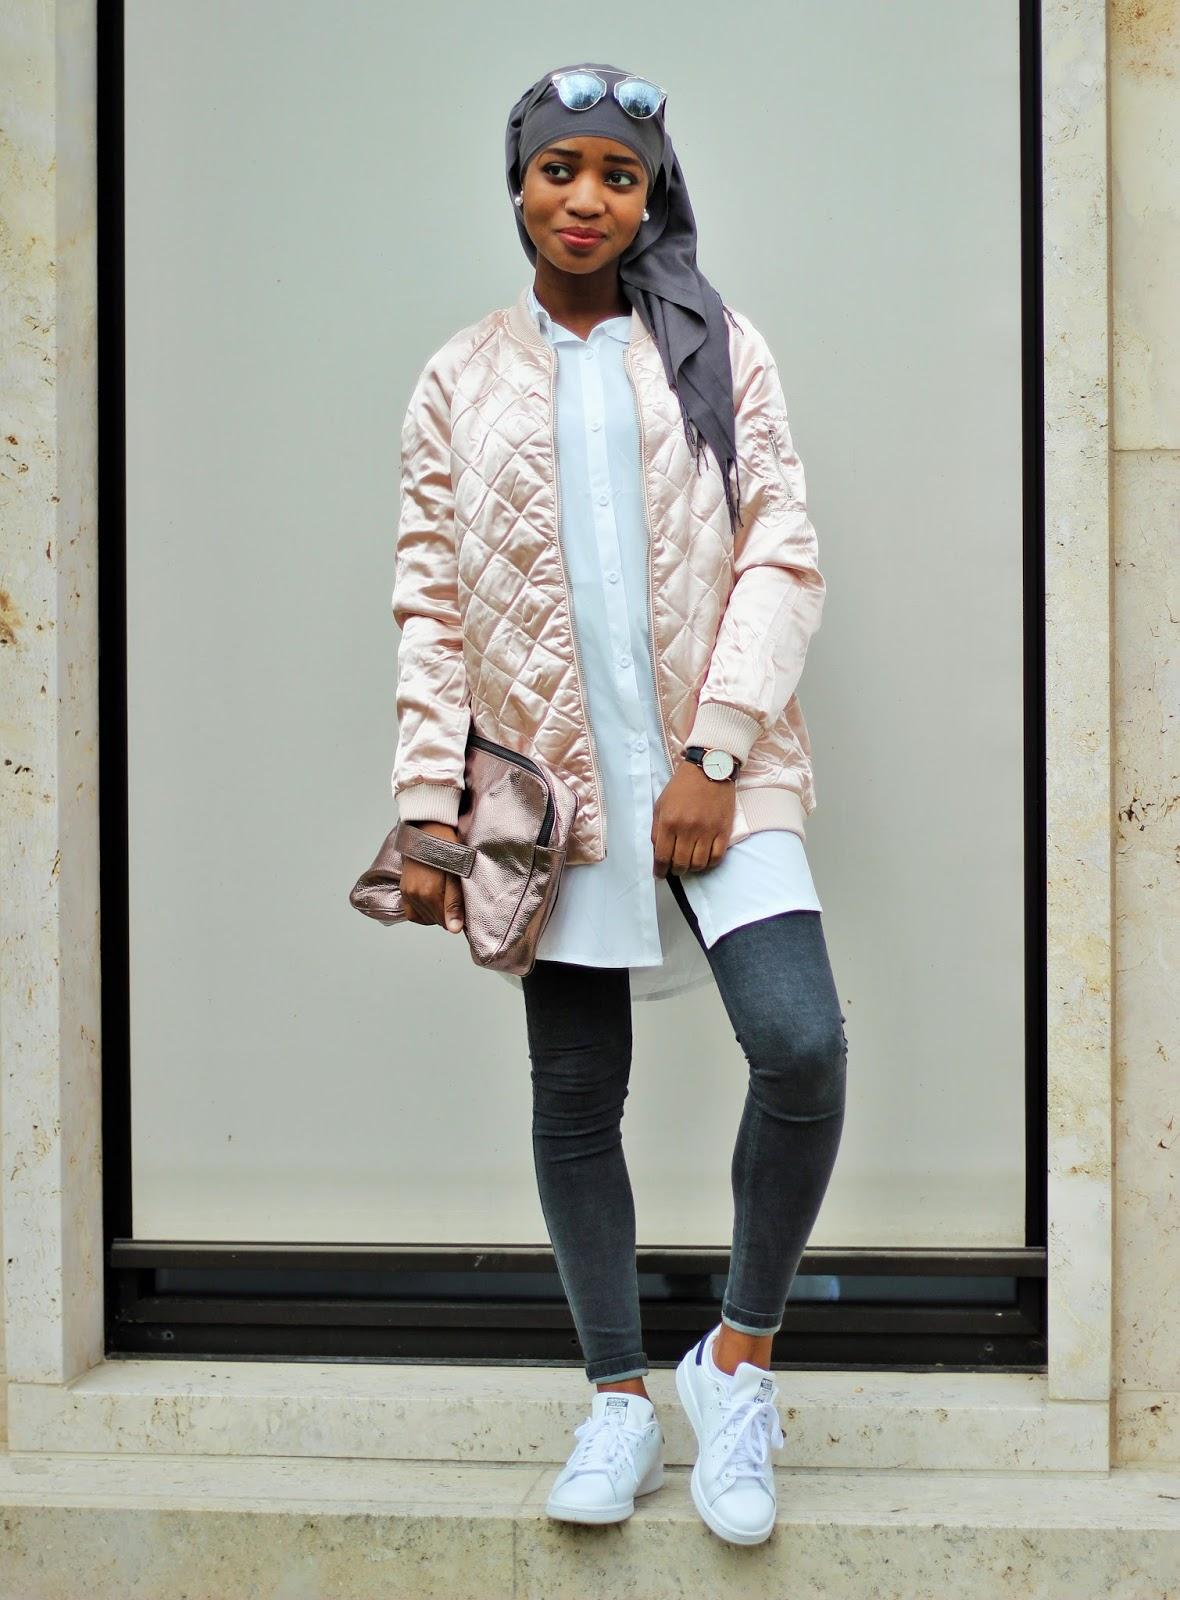 Der Mode Blog: Adidas Schuhe mal selbst designt: mi adidas